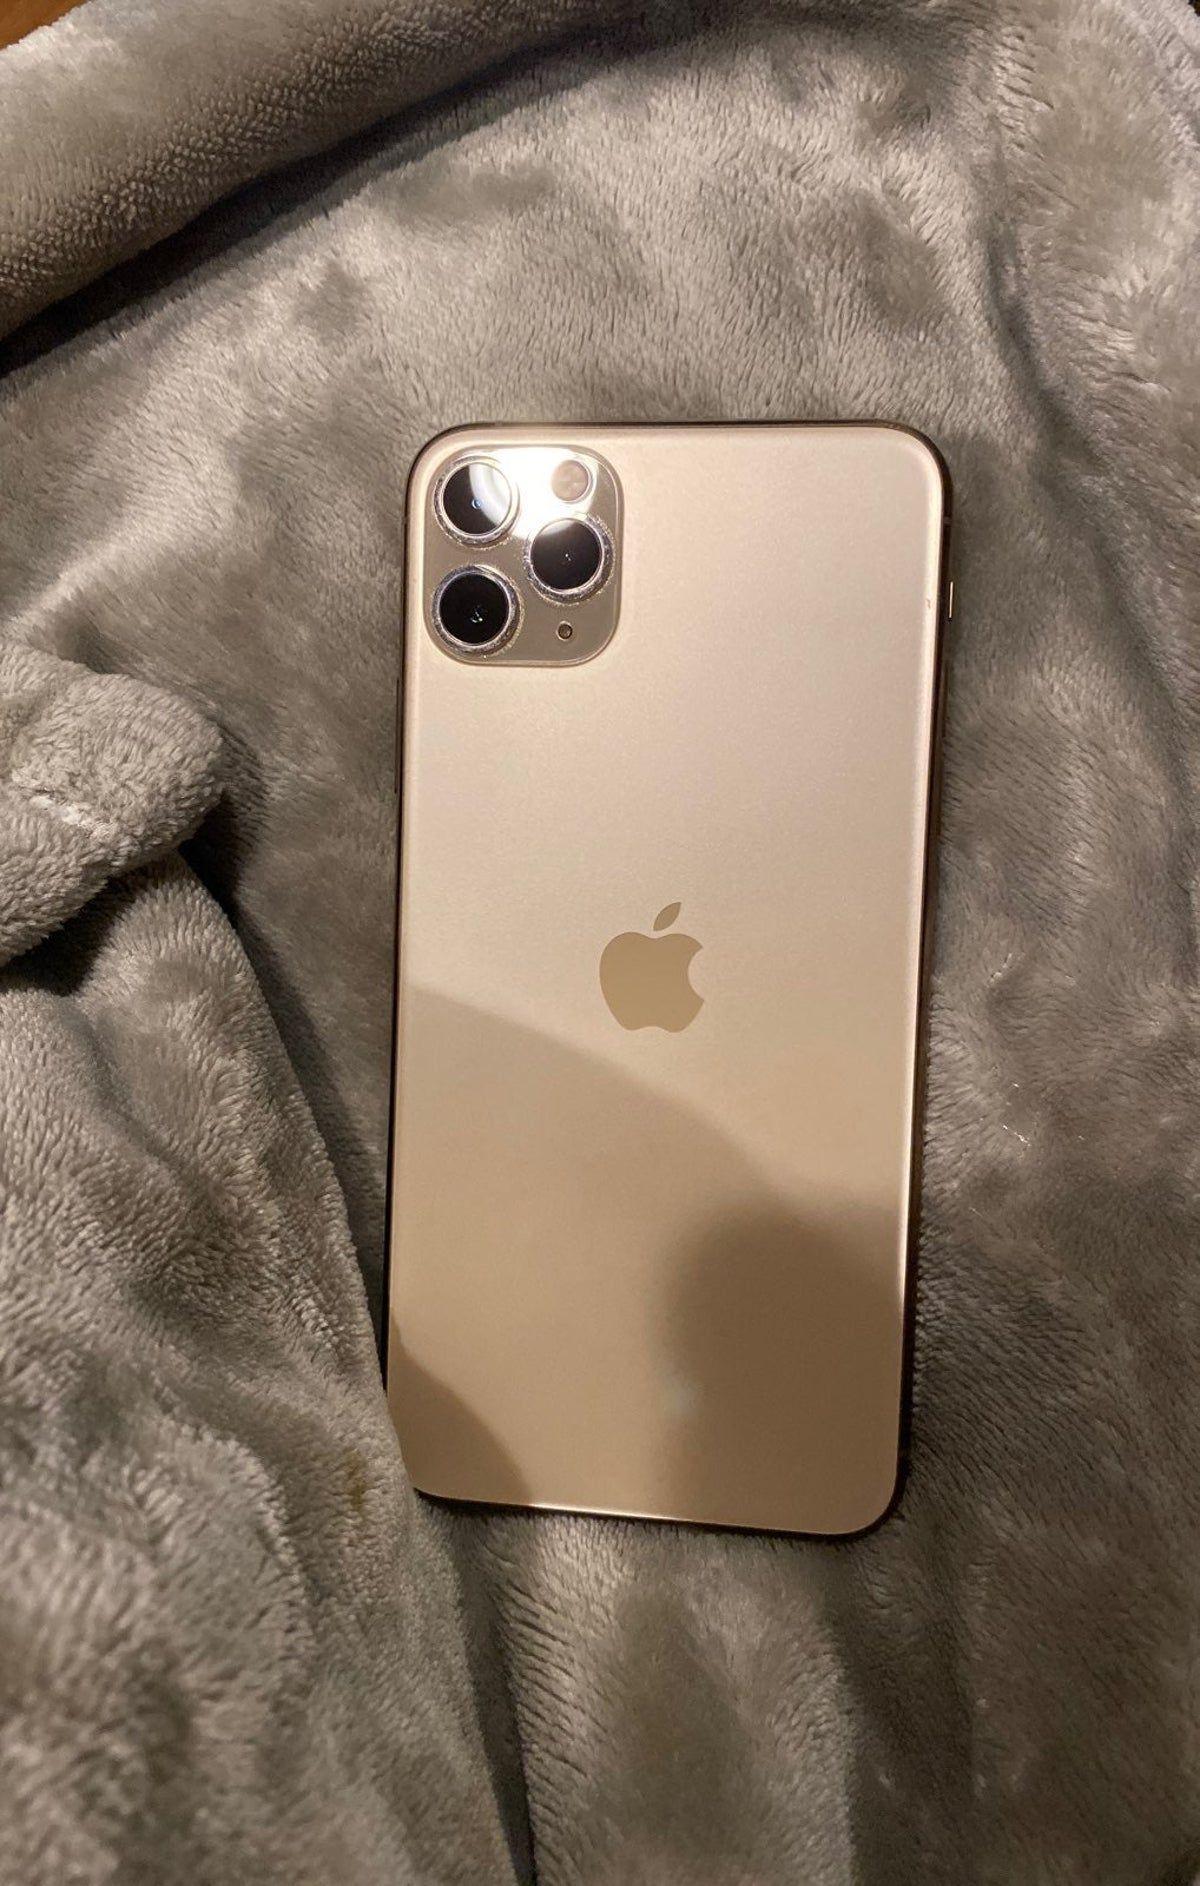 Iphone 11 Pro Max Rose Gold 512gb On Mercari Iphone 11 Pro Max Rose Gold Iphone Iphone 11 Pro Max Gold